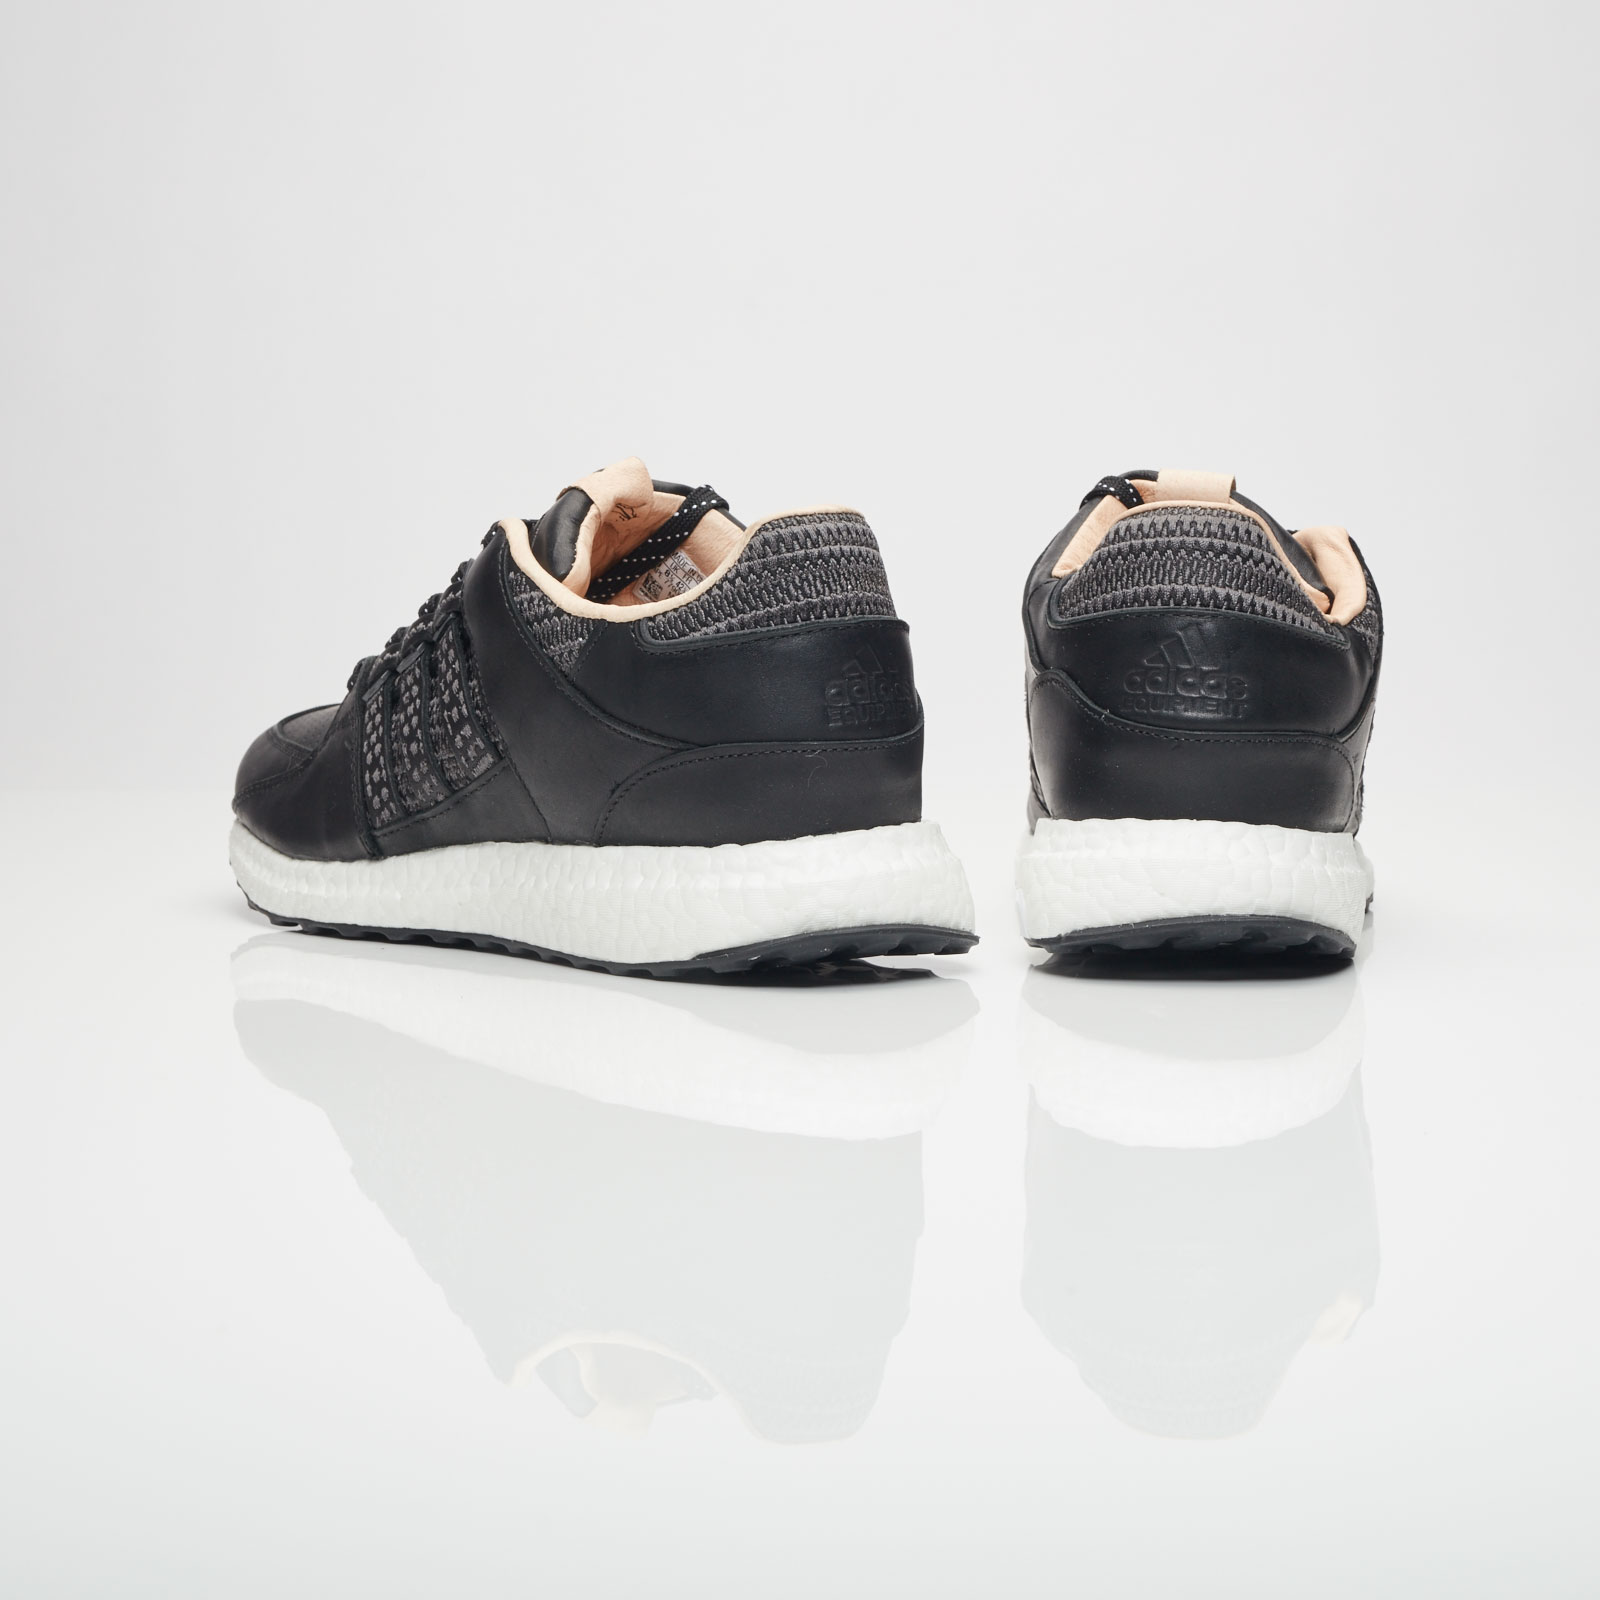 premium selection e04c4 0de75 adidas Equipment Support 93 16 Avenue - Cp9639 - Sneakersnstuff   sneakers    streetwear online since 1999